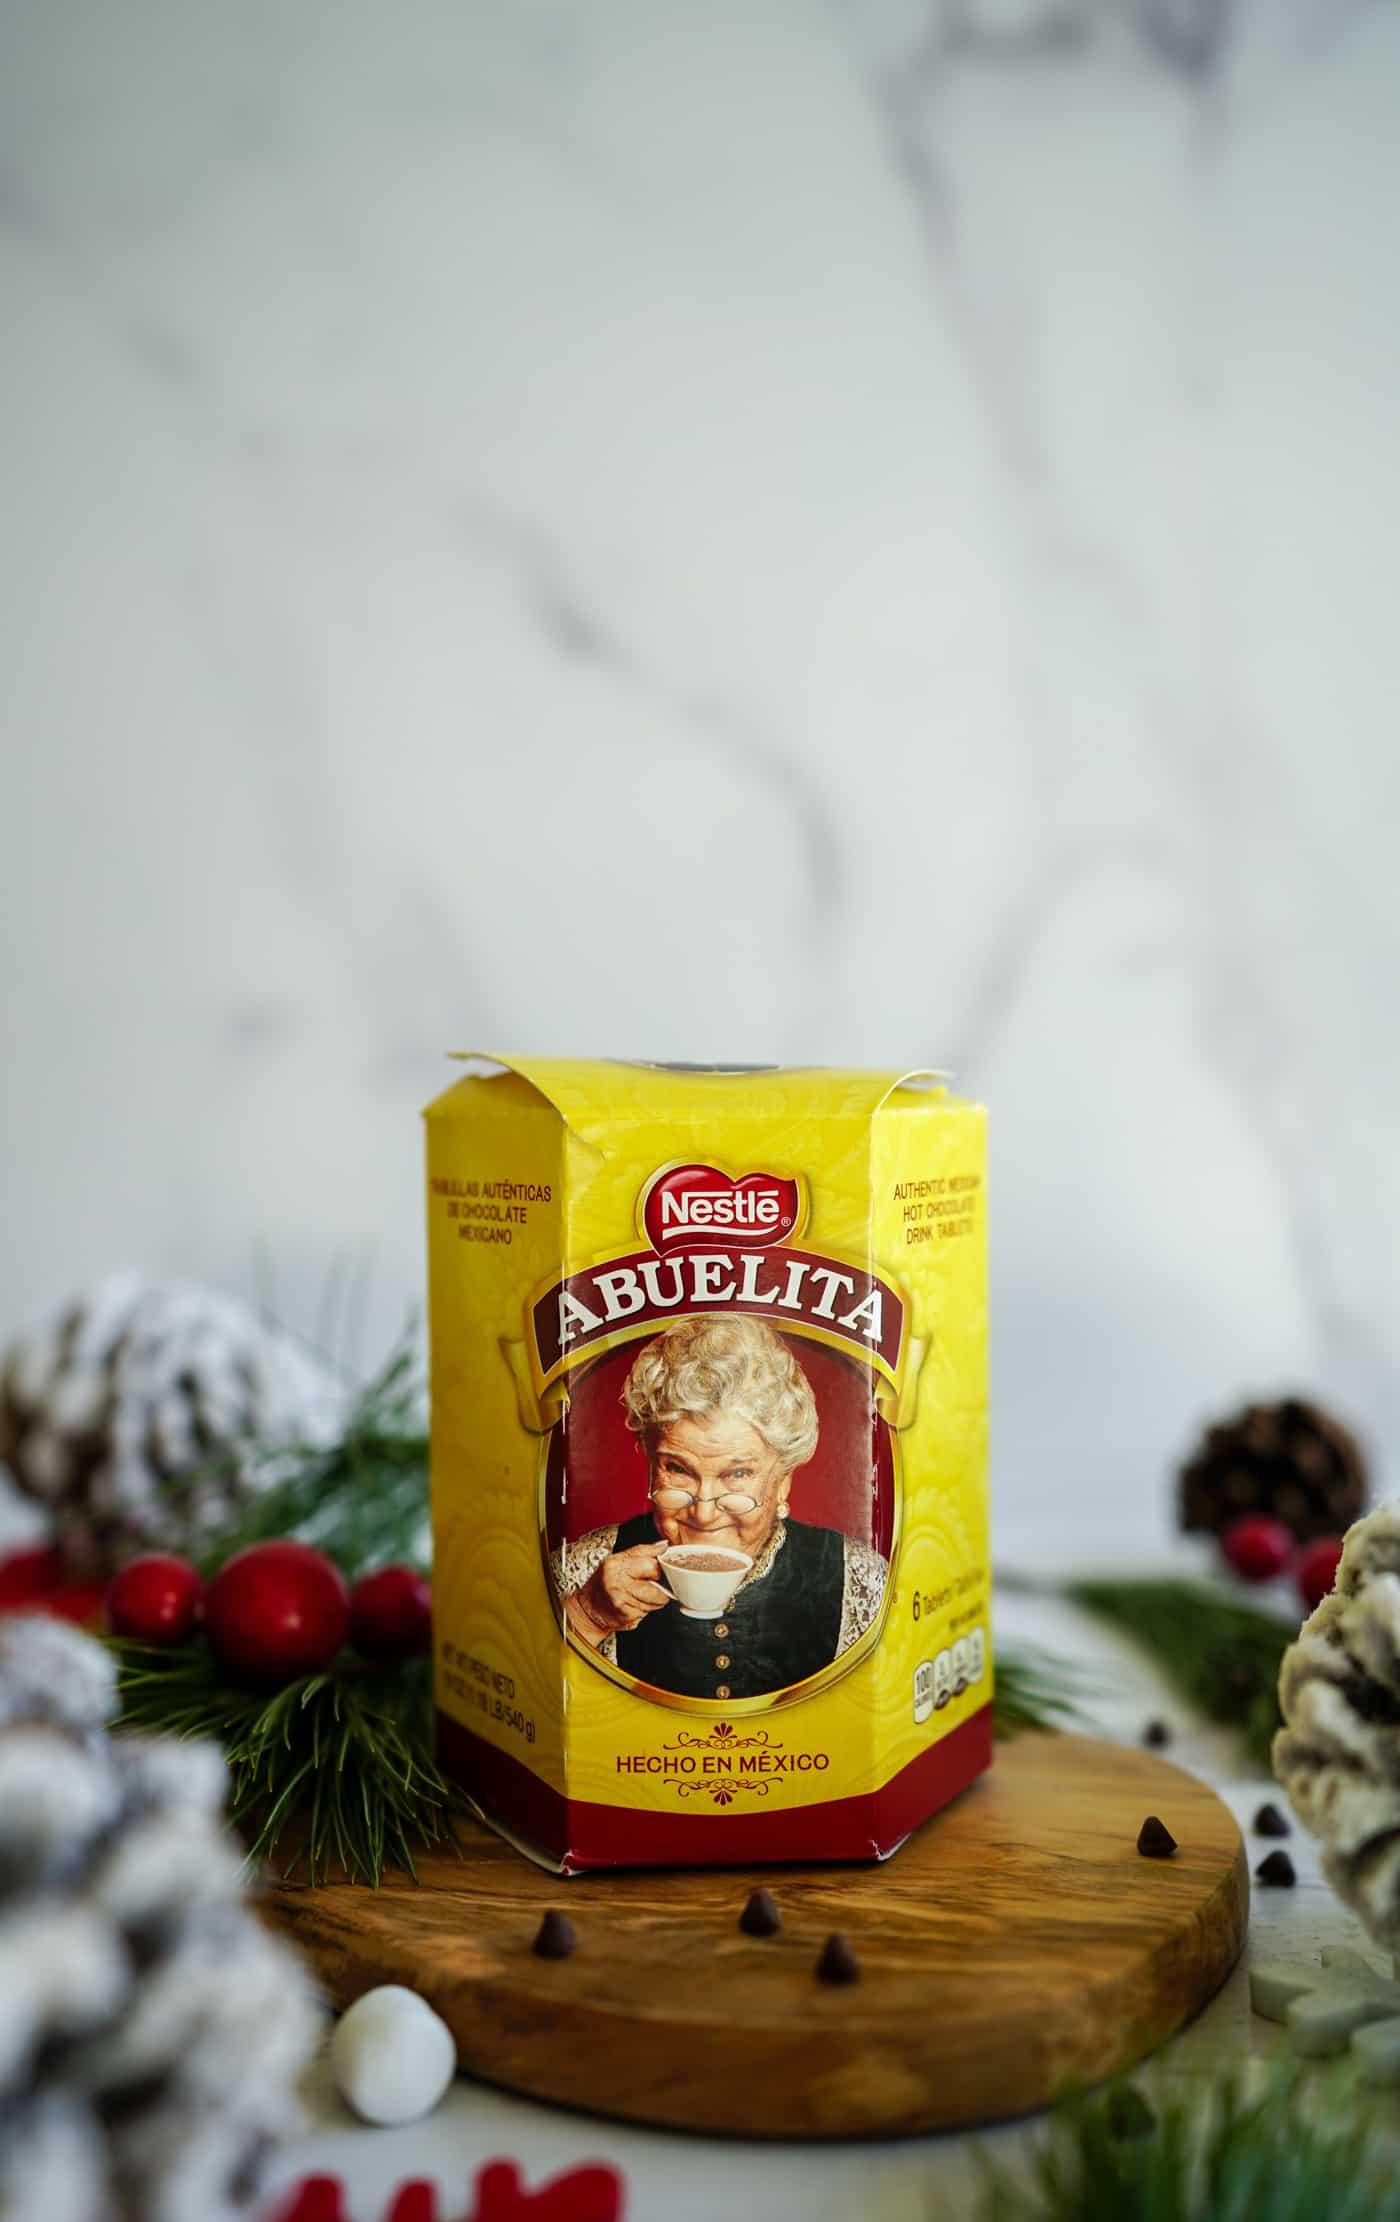 A package of Abutlita chocolate